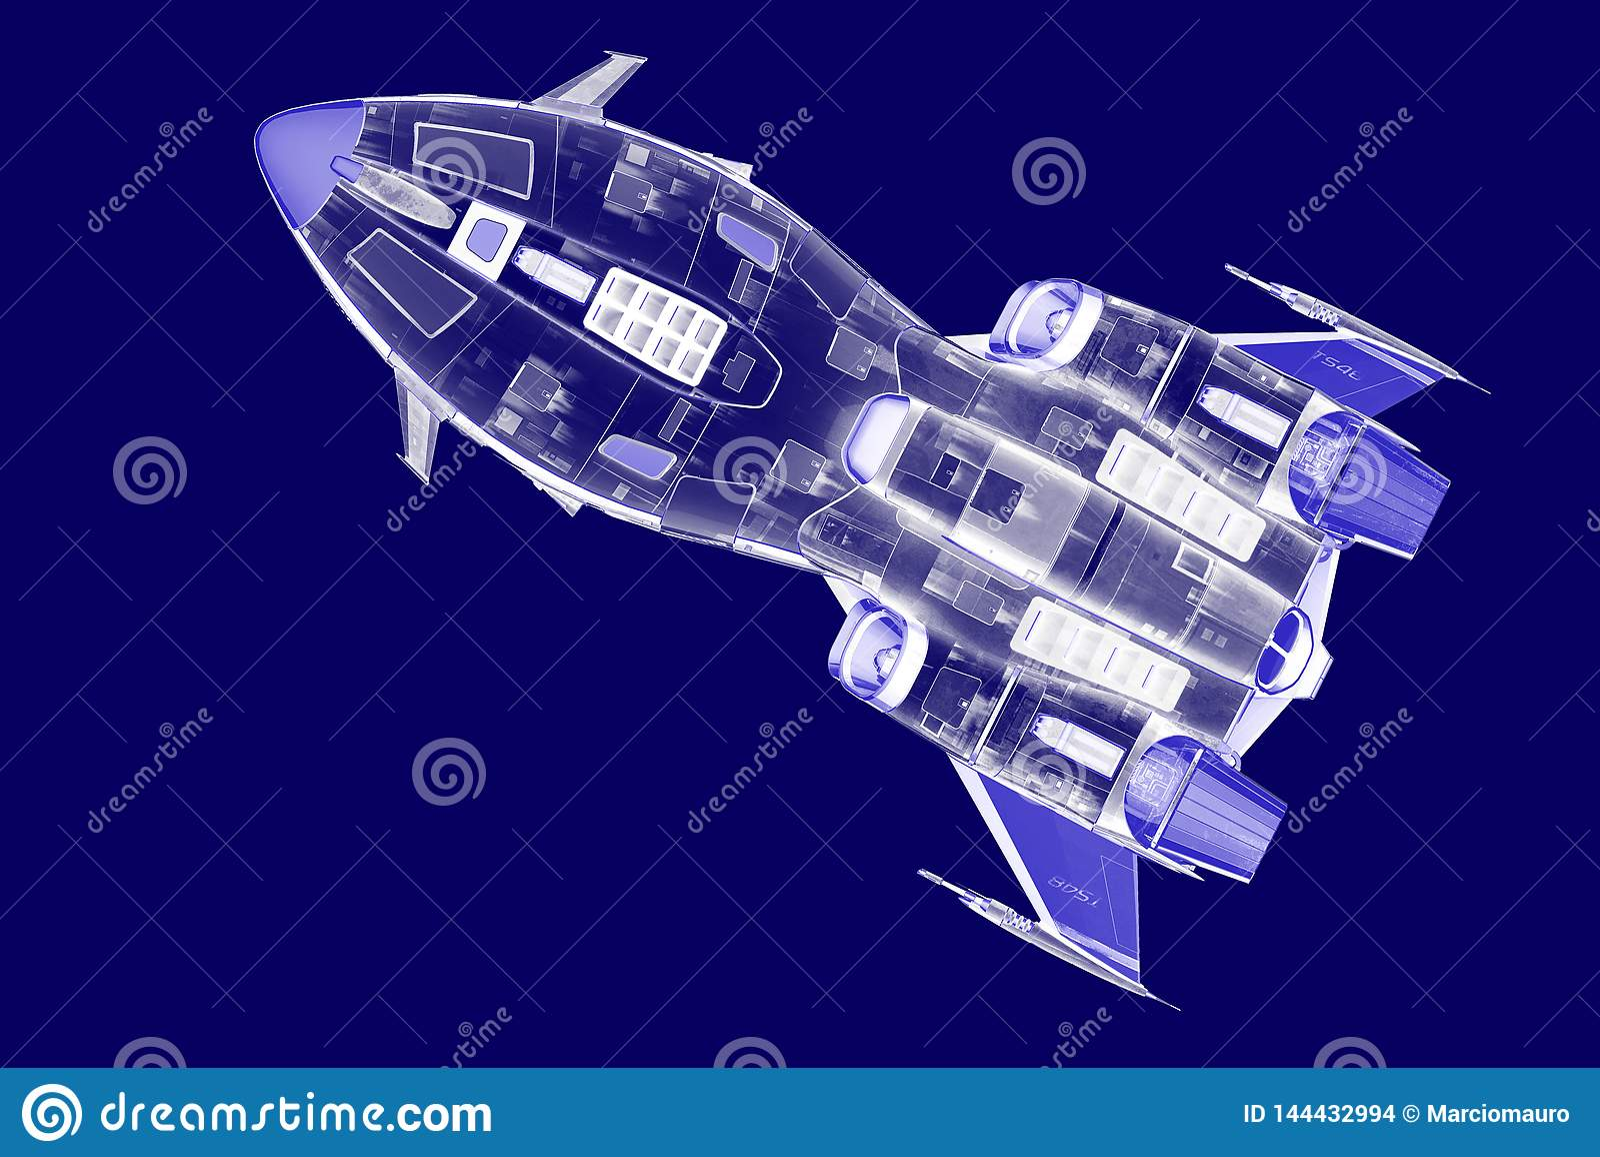 Blue Spaceship Blue Print Duotone Stock Illustration - Illustration